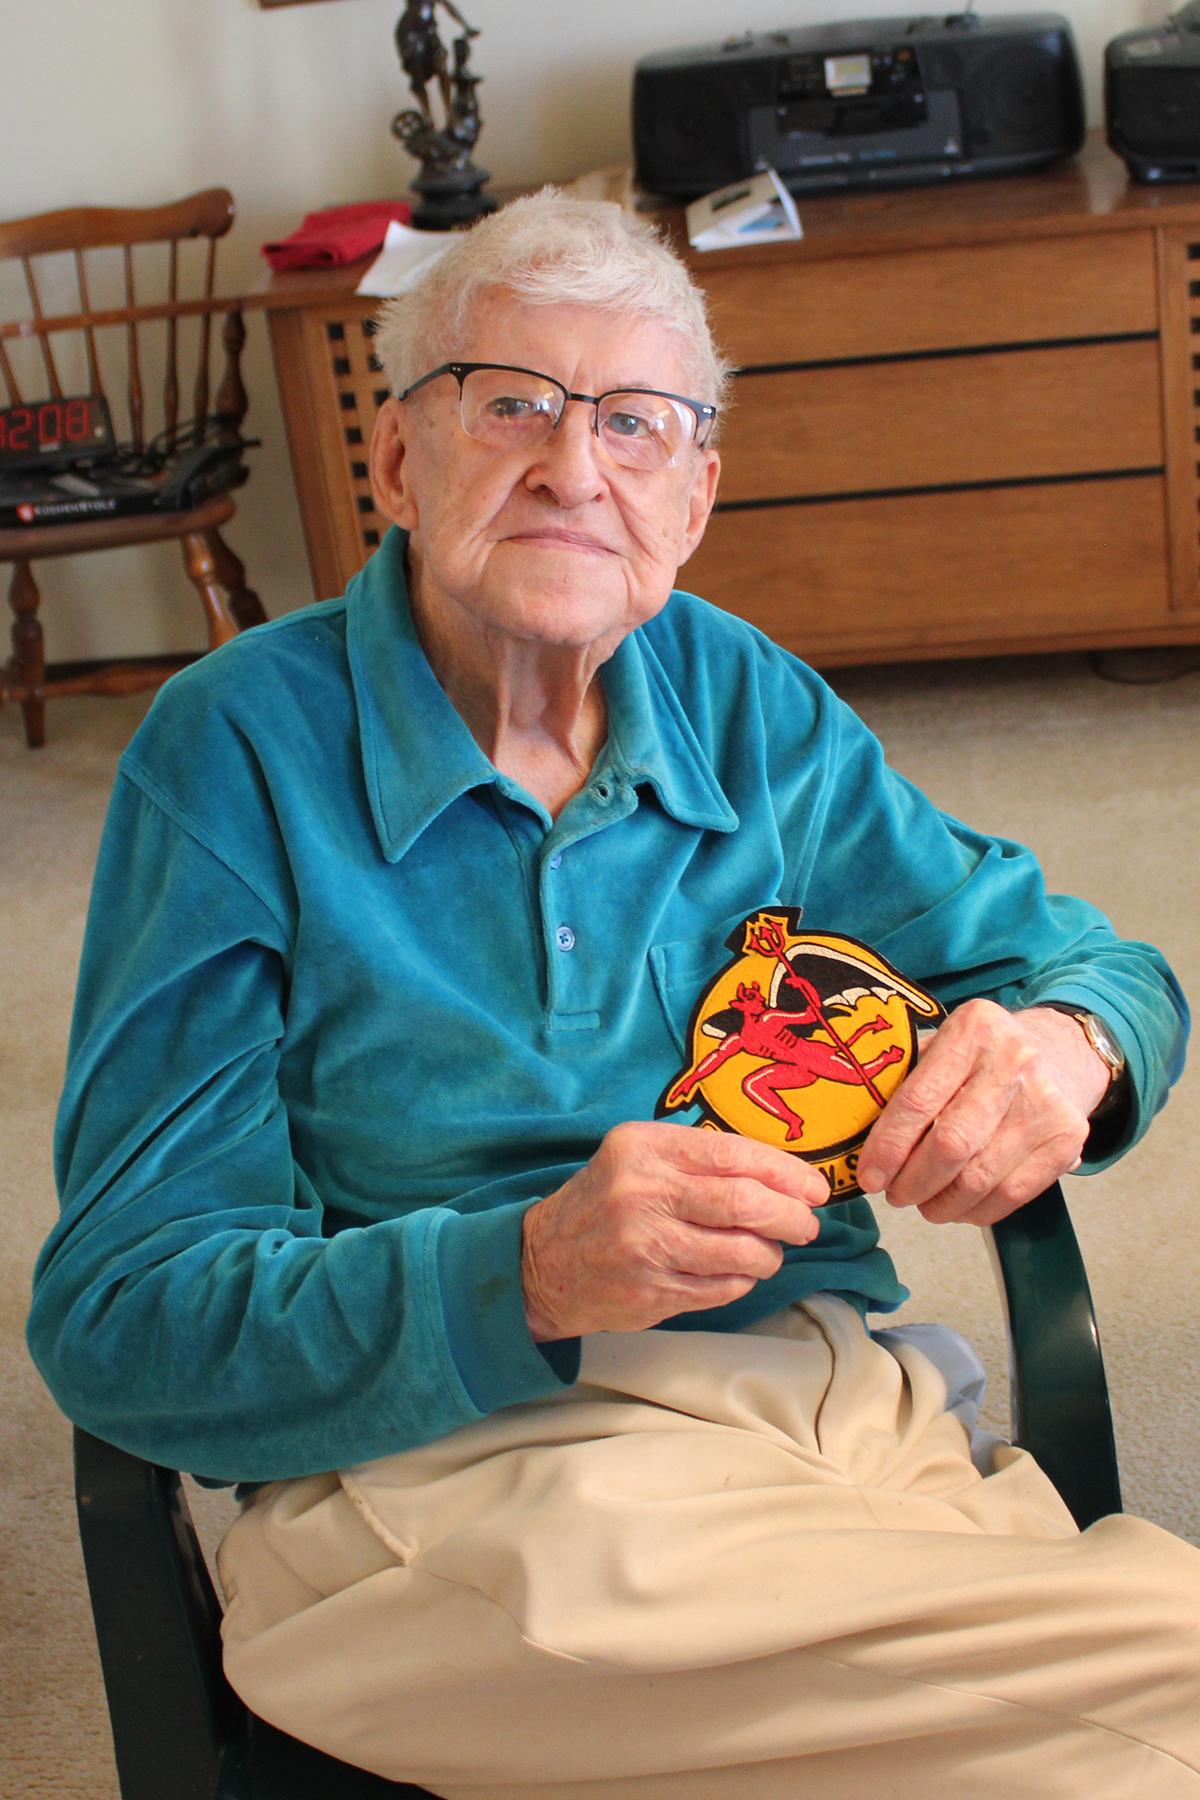 102-year-old veteran recalls duty with Michigan National Guard